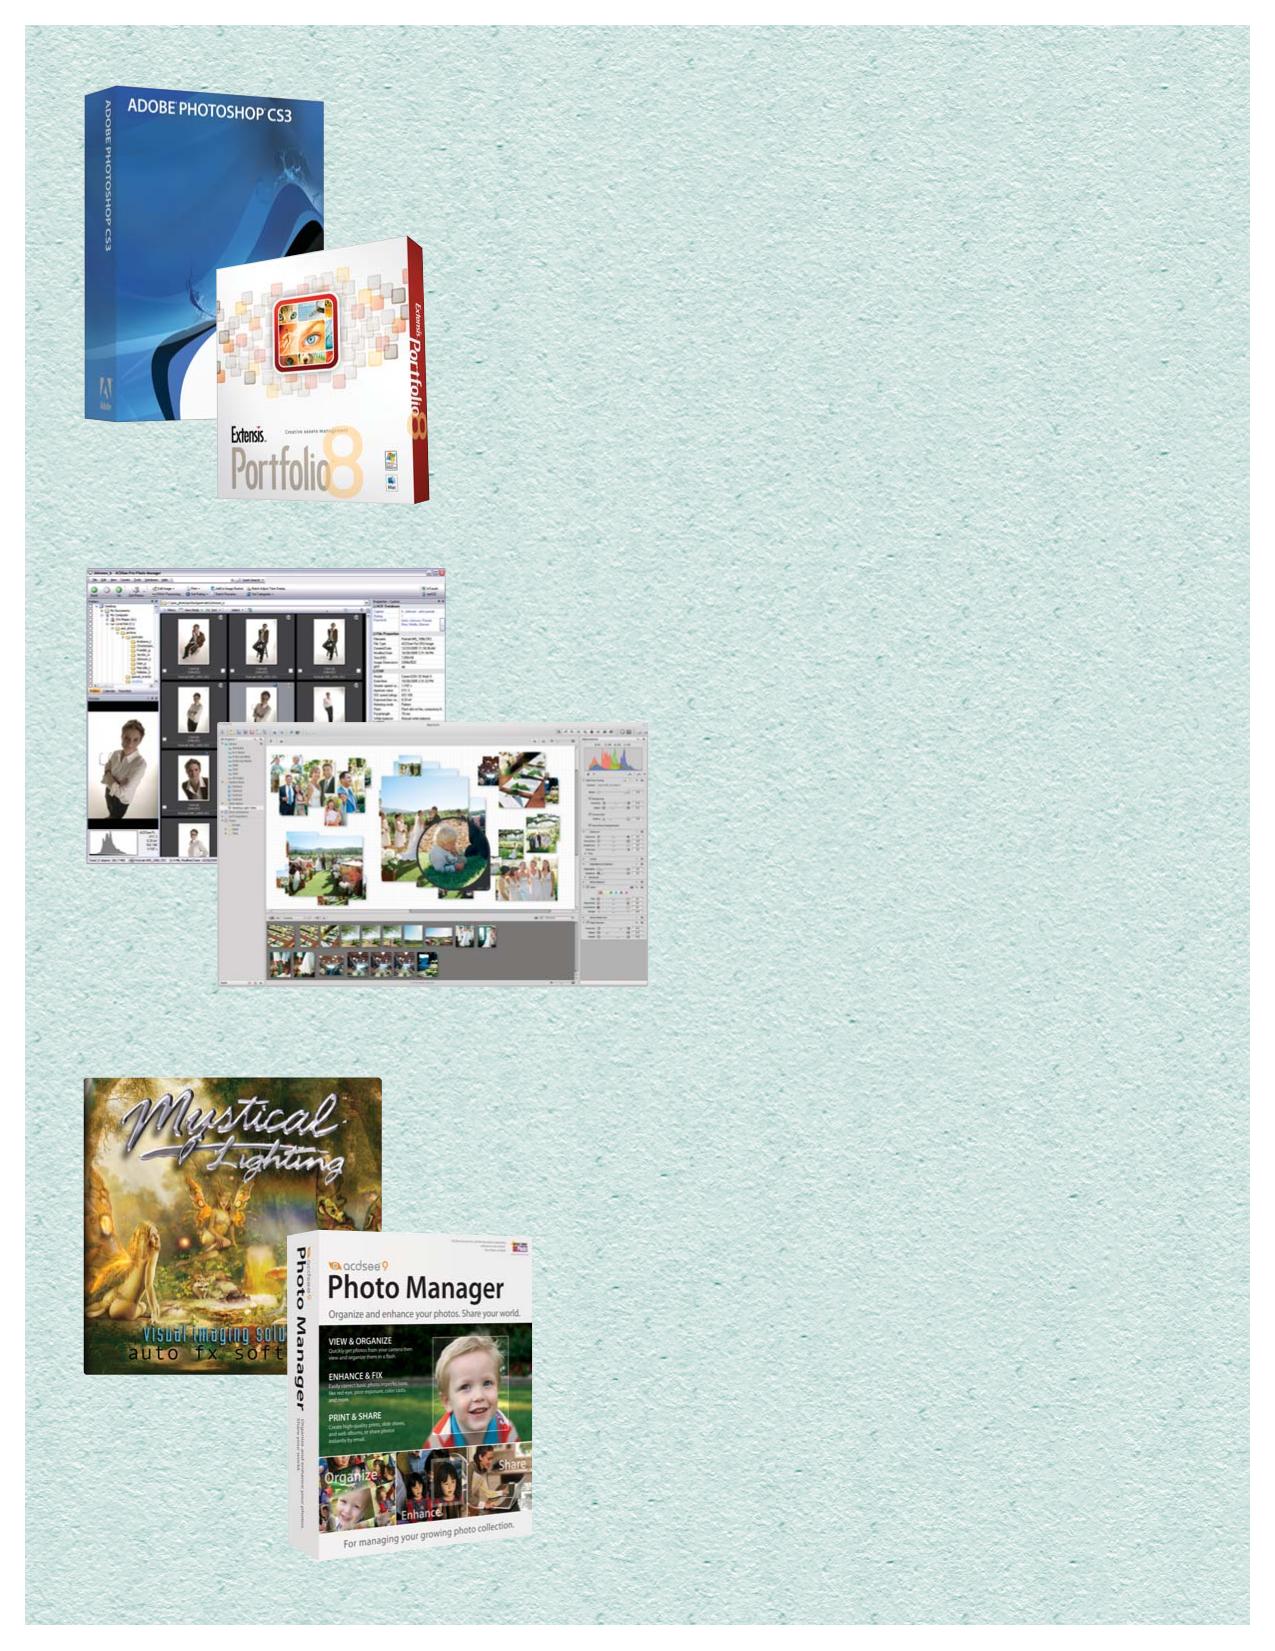 pdf for Wacom Mouse Intuos3 4x6 manual